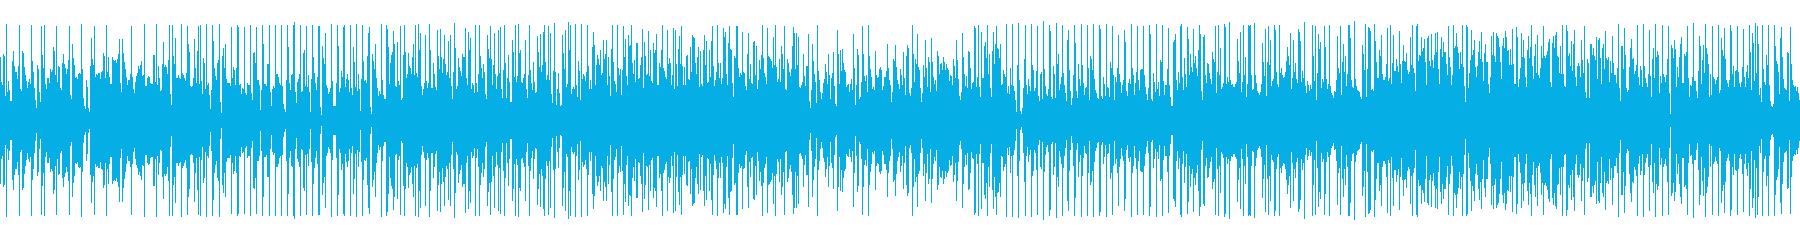 BGM013-01 商品紹介、会社紹介…の再生済みの波形